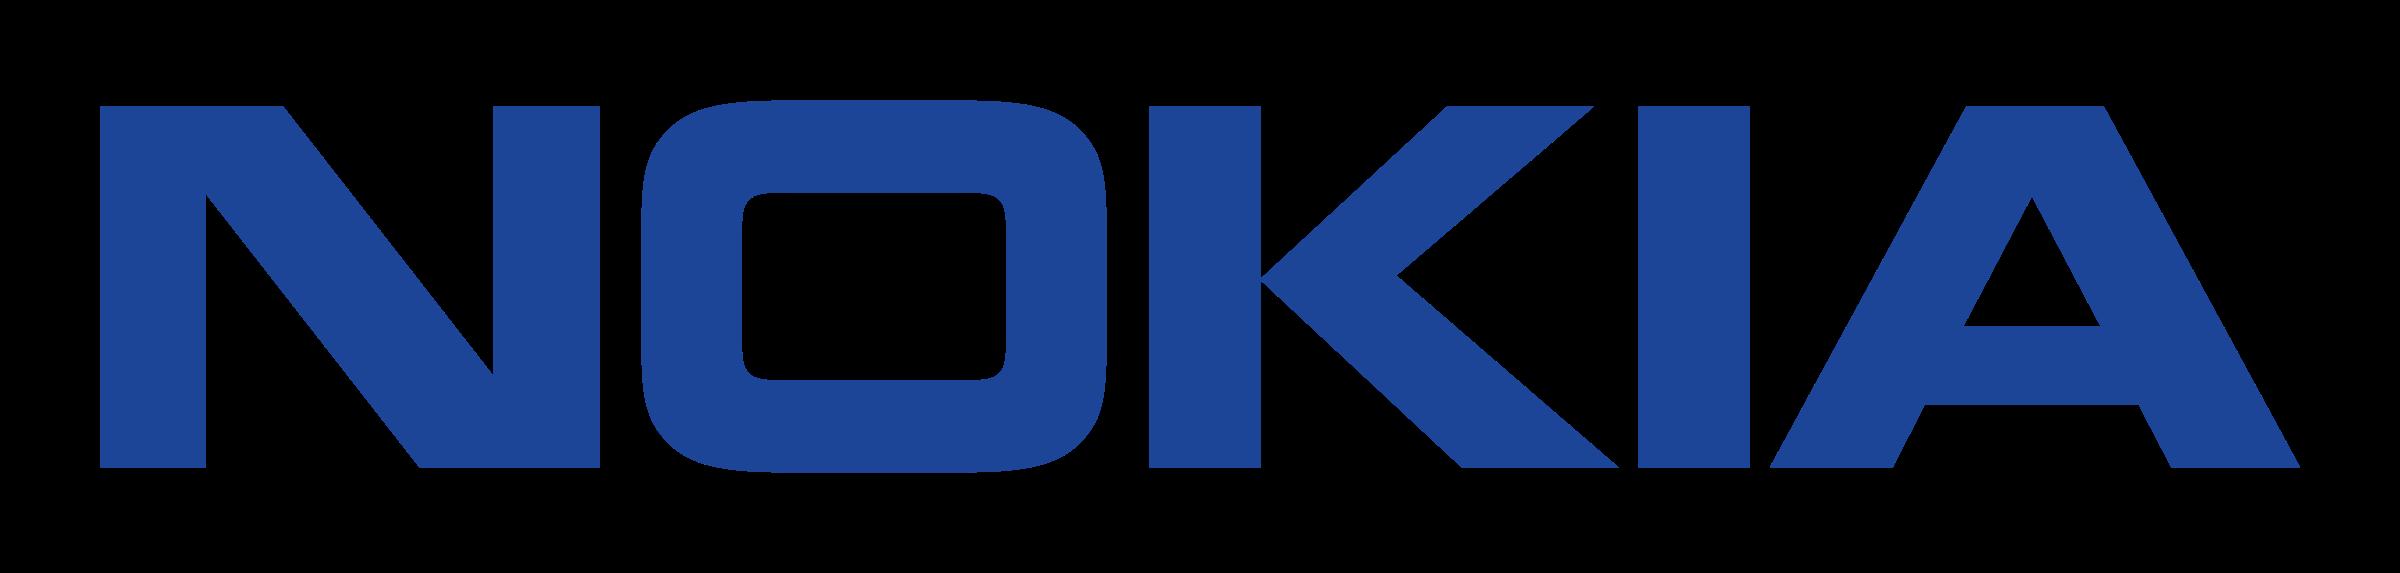 Nokia Logo PNG Transparent & SVG Vector - Freebie Supply